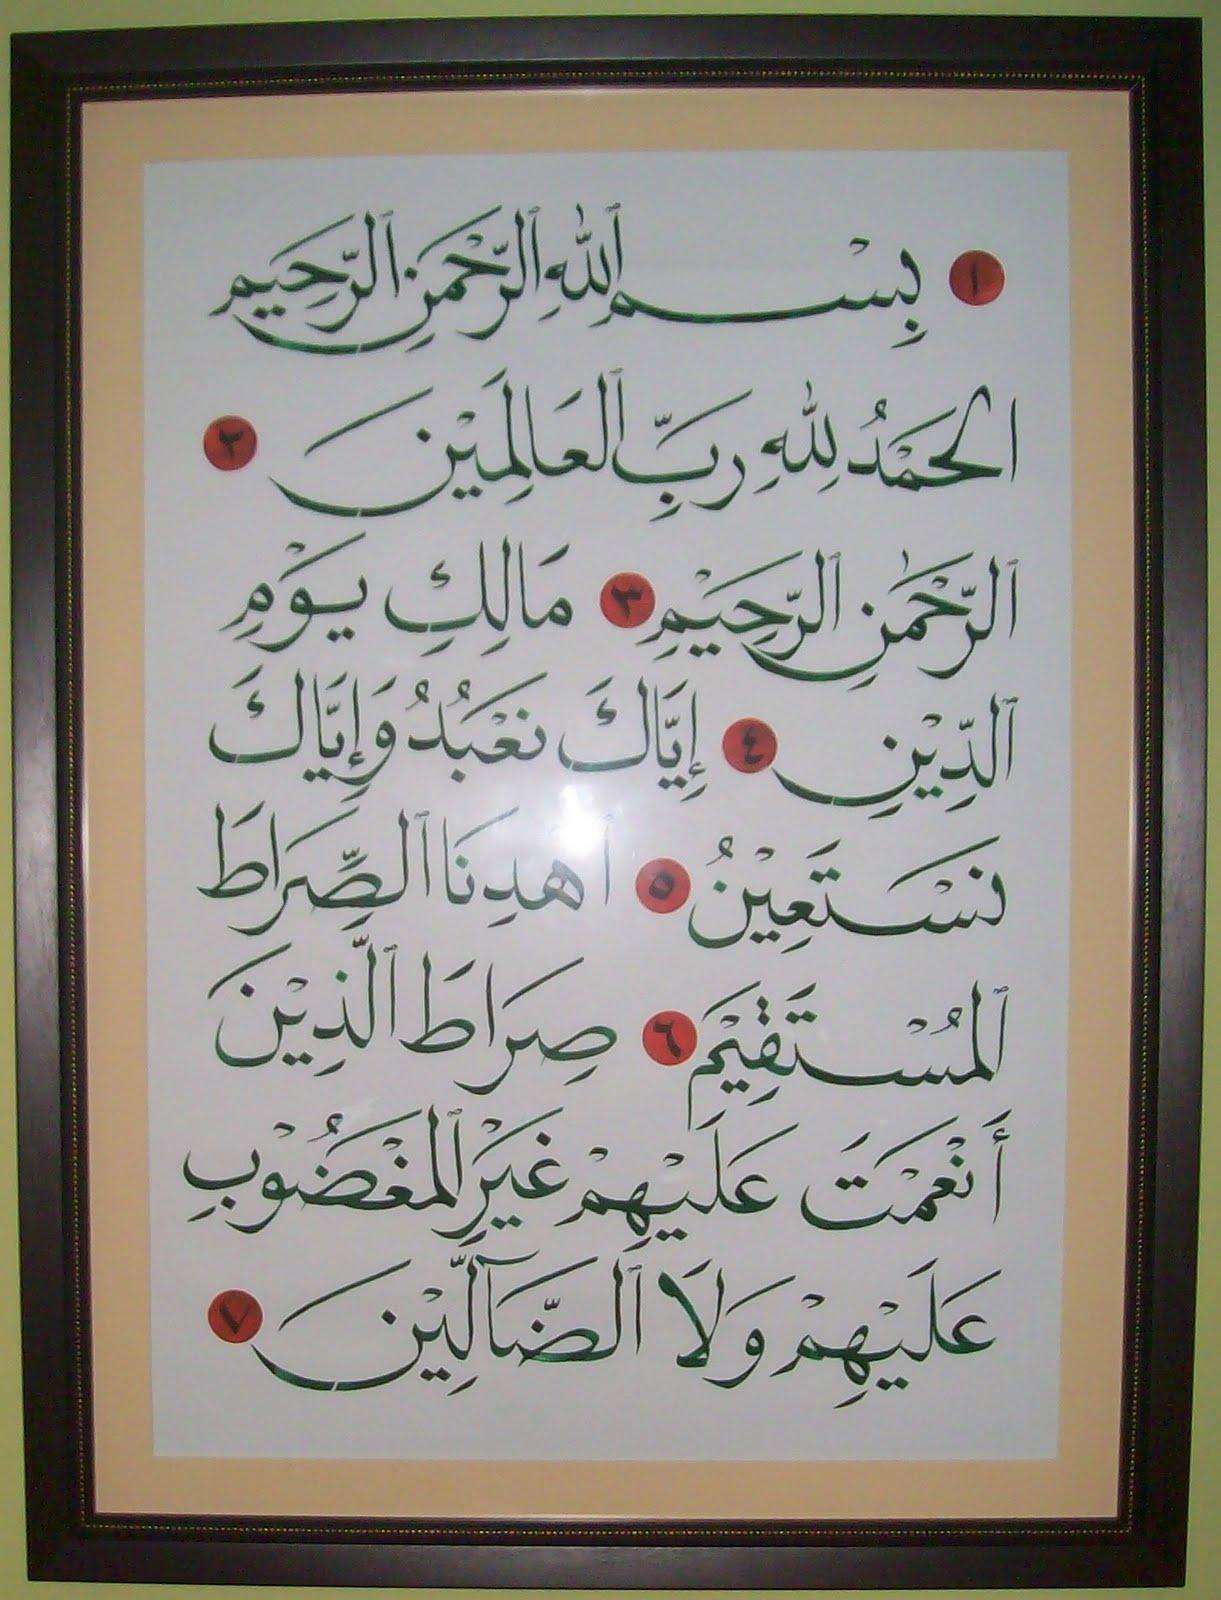 Contoh Kaligrafi Surat Al Ikhlas Sederhana Berbagi Cerita